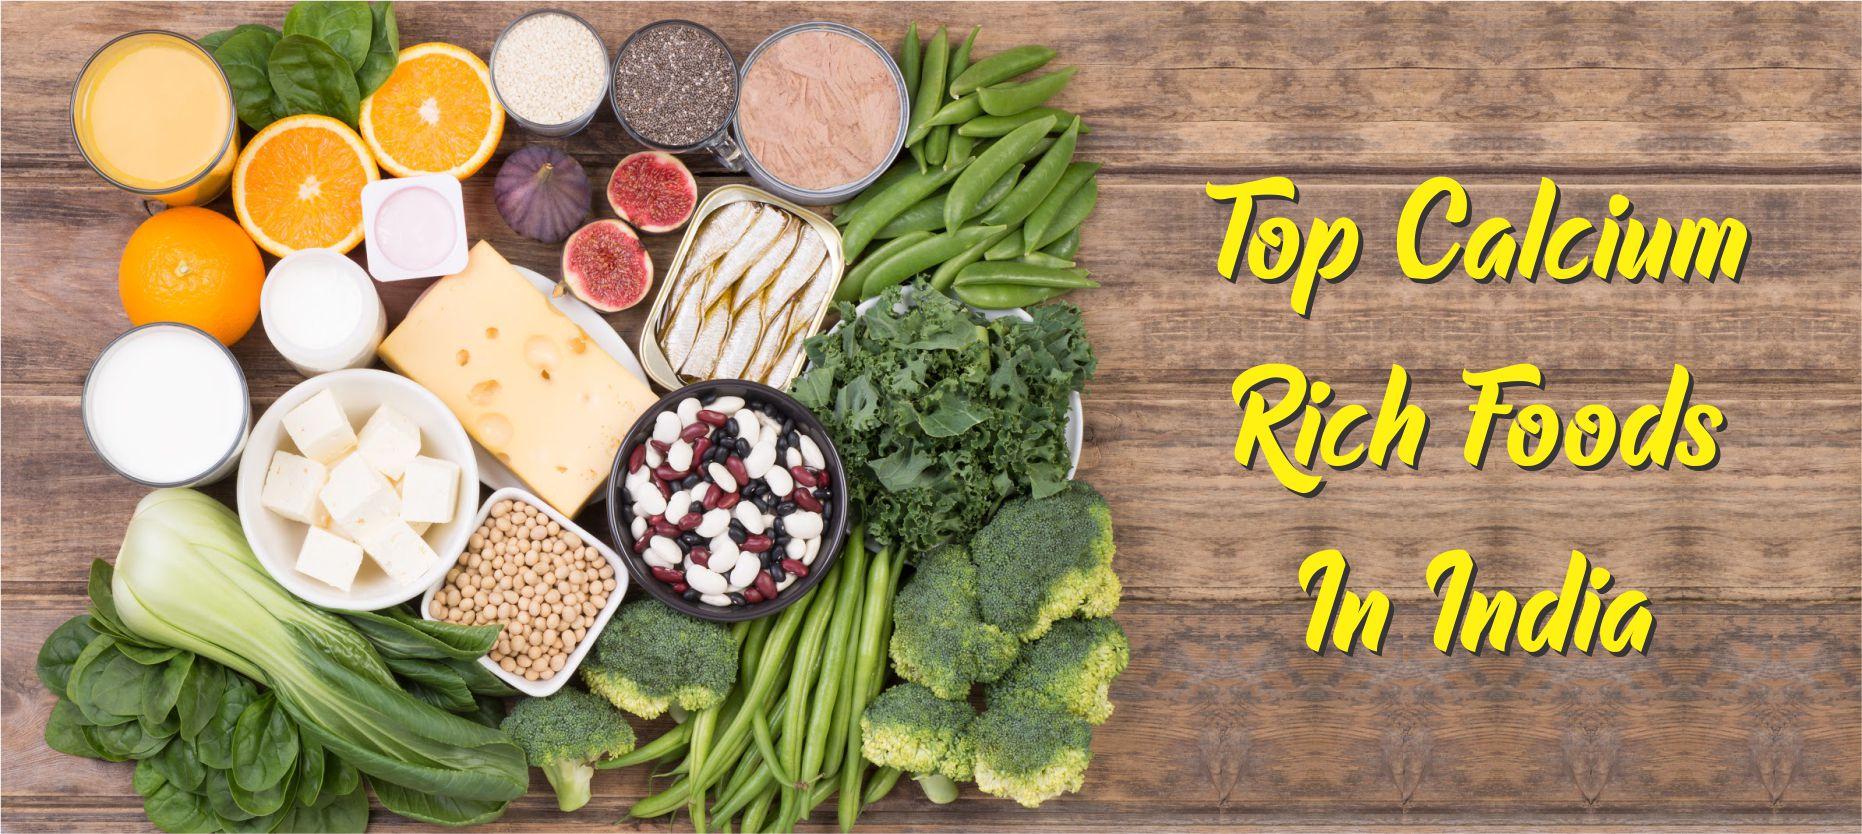 Top 13 Calcium Rich Indian Foods List